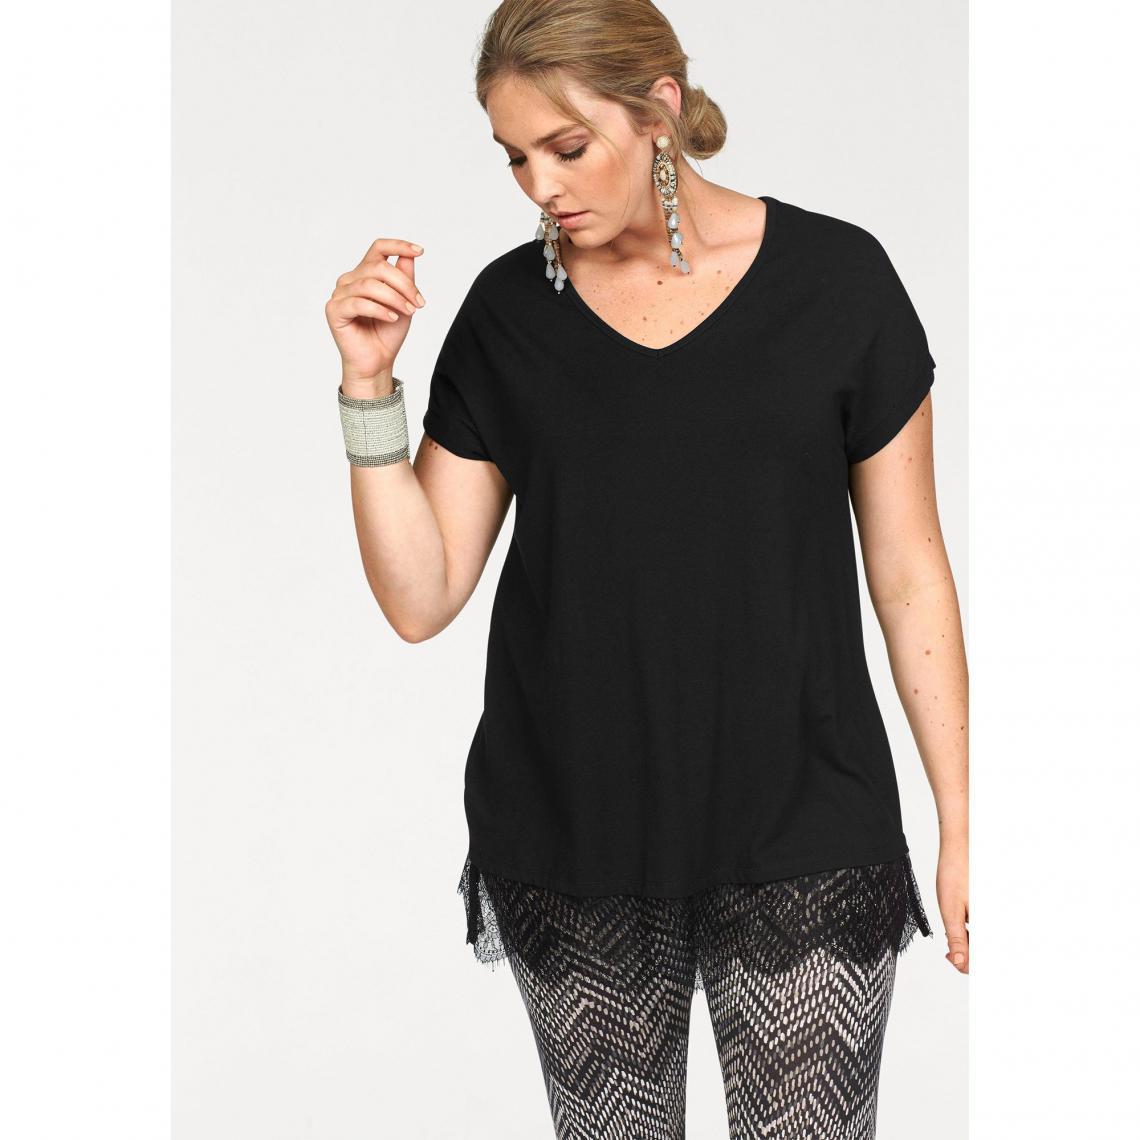 06390a68be34a T-shirt long manches courtes bas en dentelle femme Boysen - Noir | 3 ...